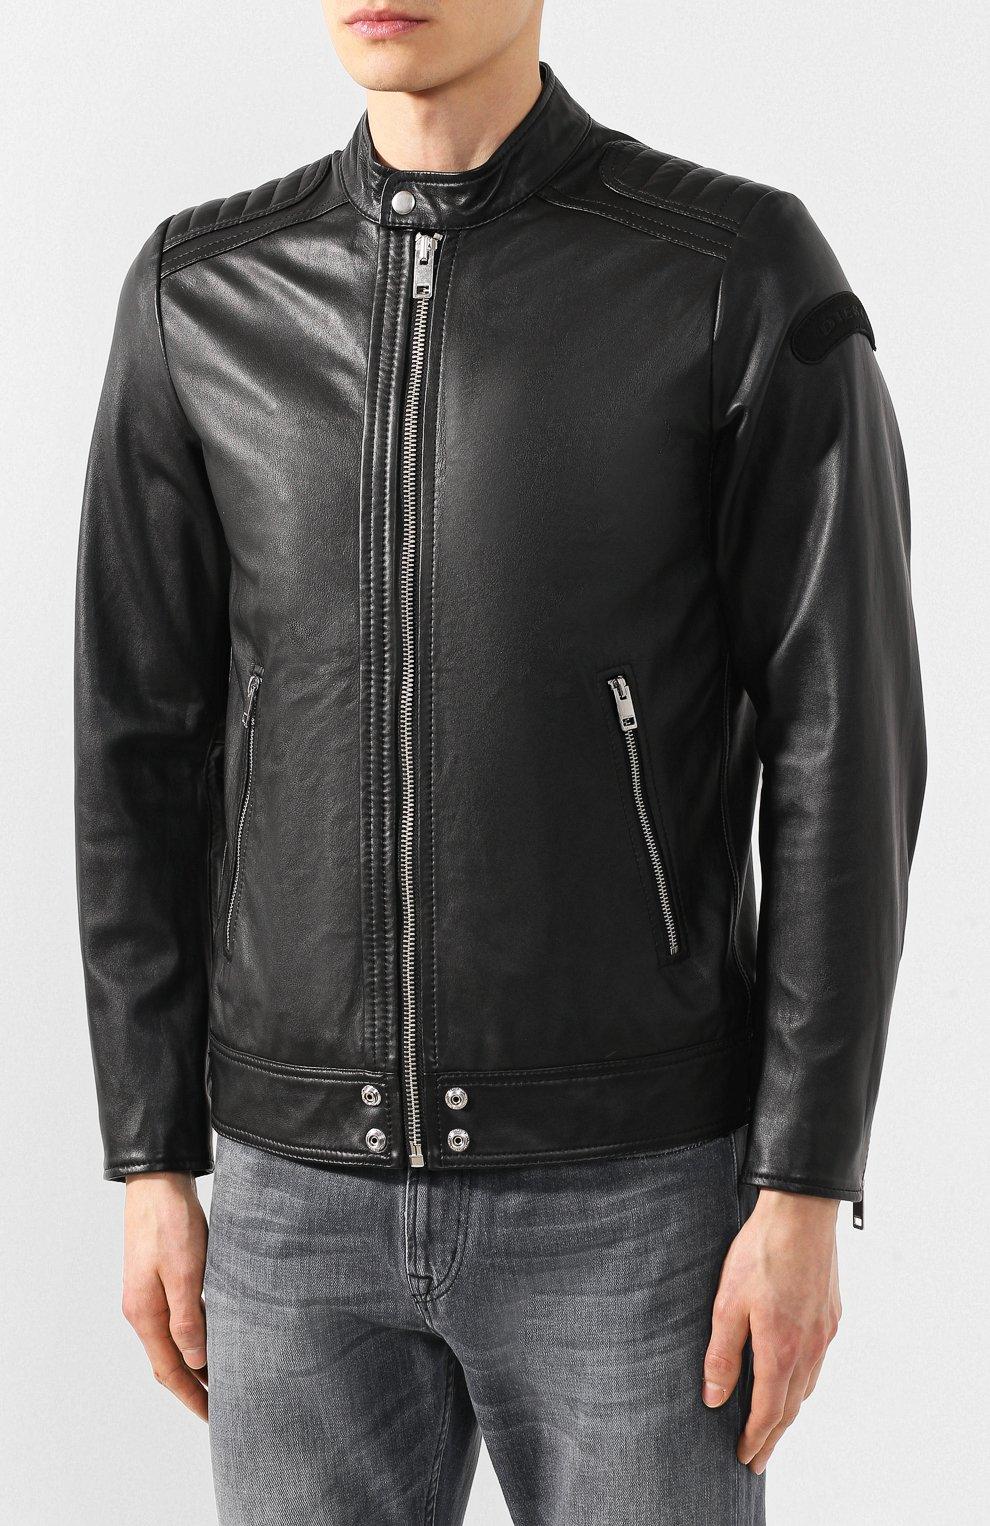 Кожаная куртка Diesel черная | Фото №3